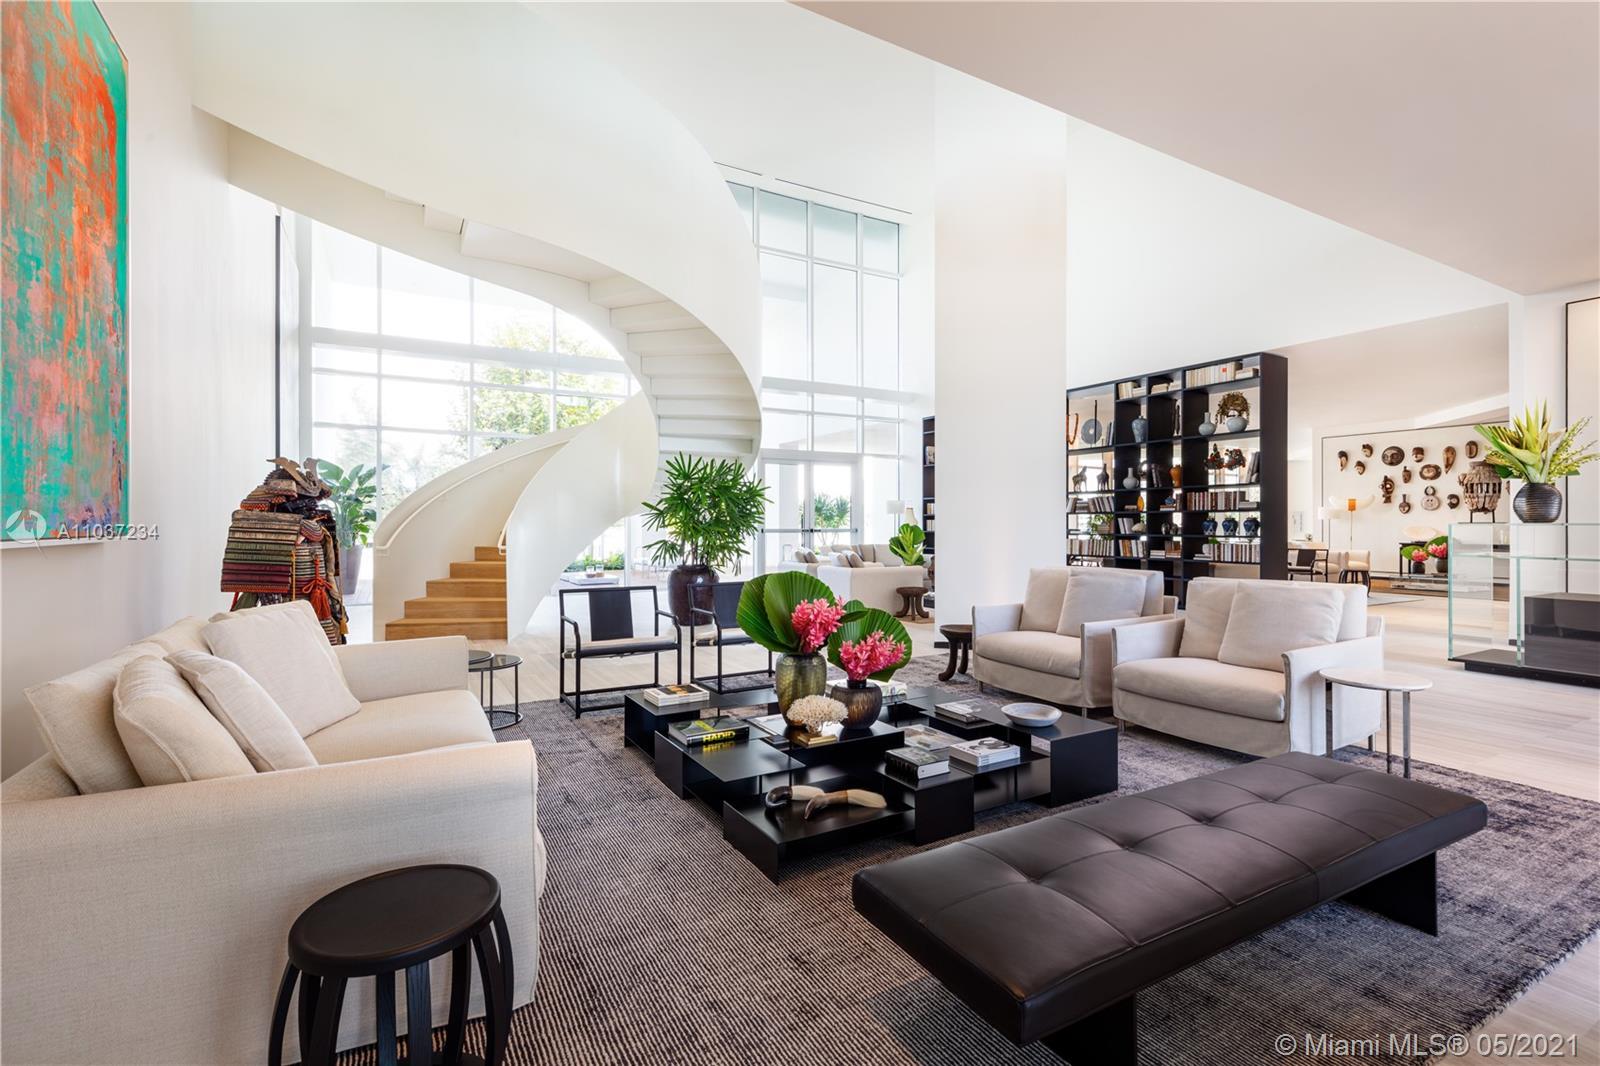 4701 N Meridian Ave, Unit #LPH02 Luxury Real Estate